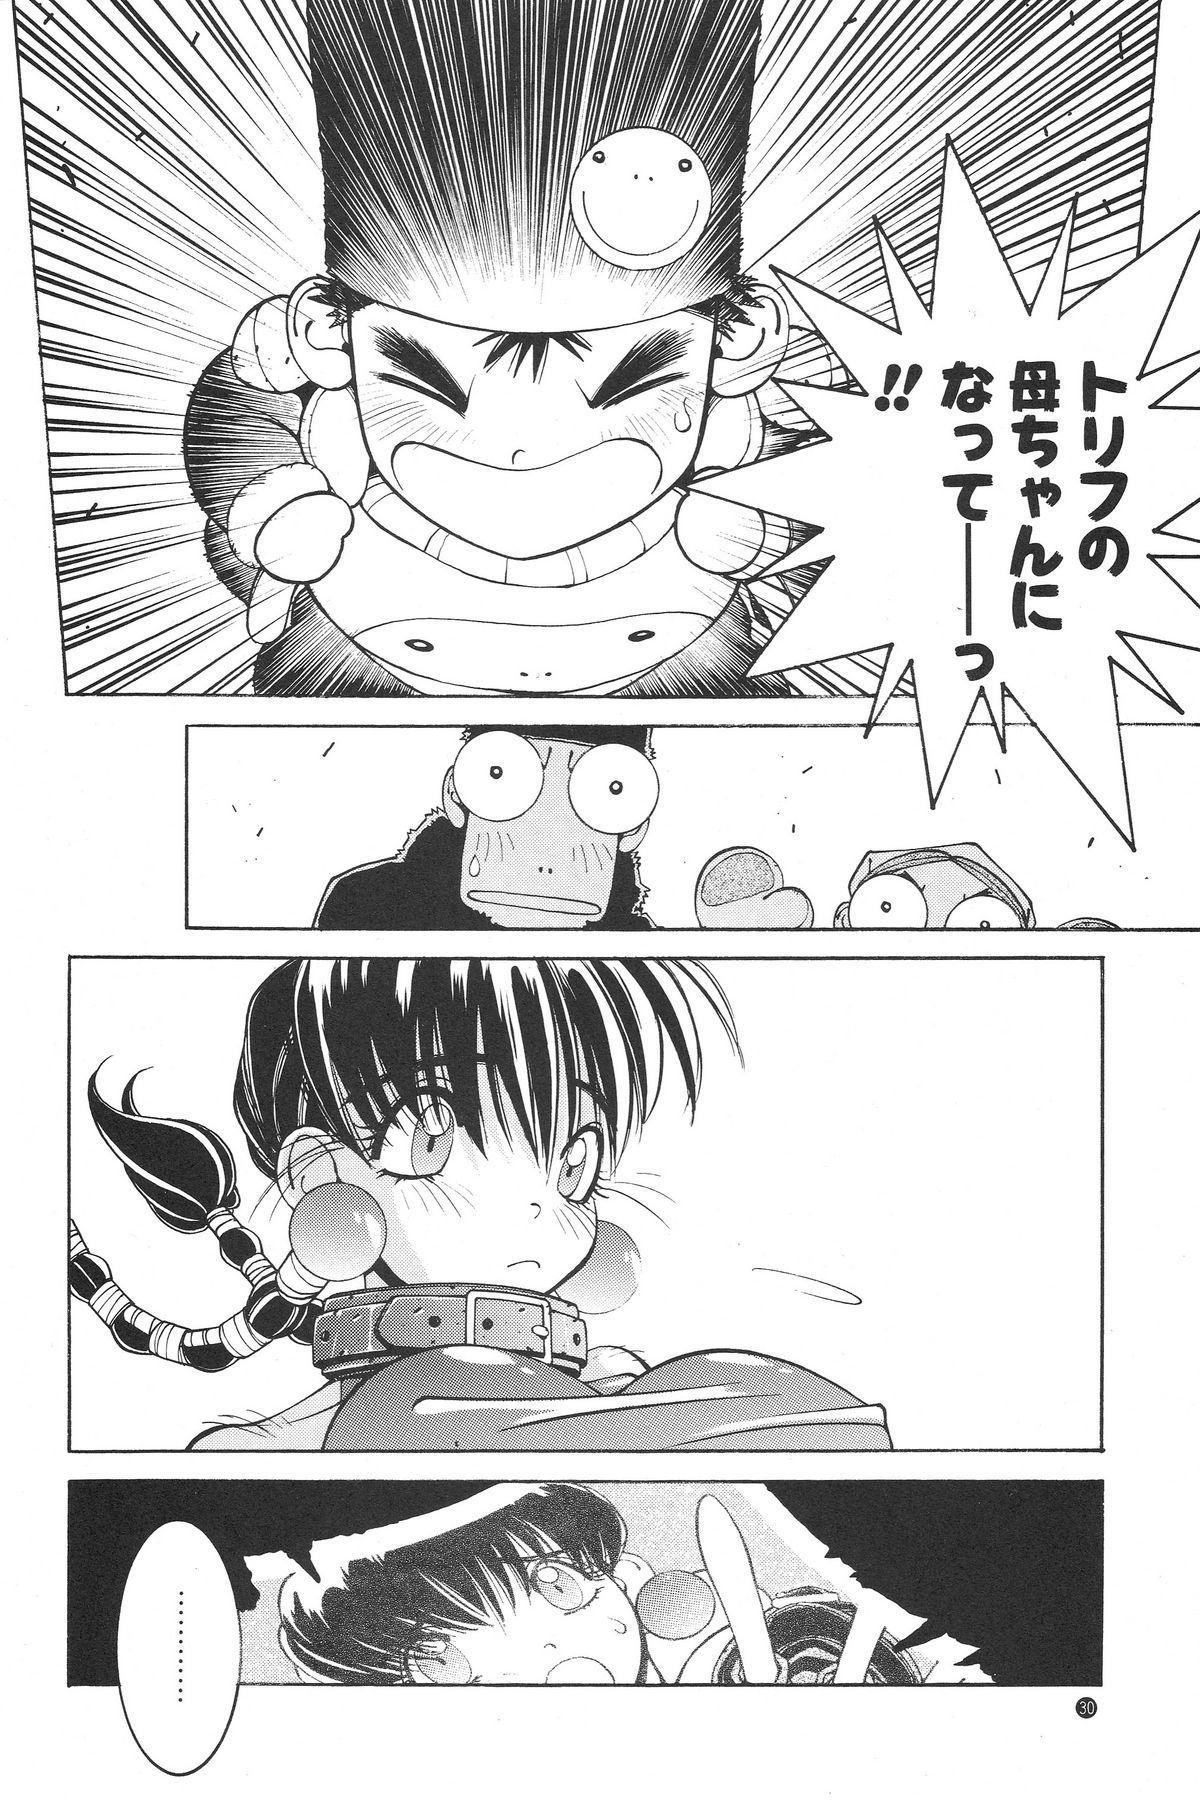 Nori-Haru 28